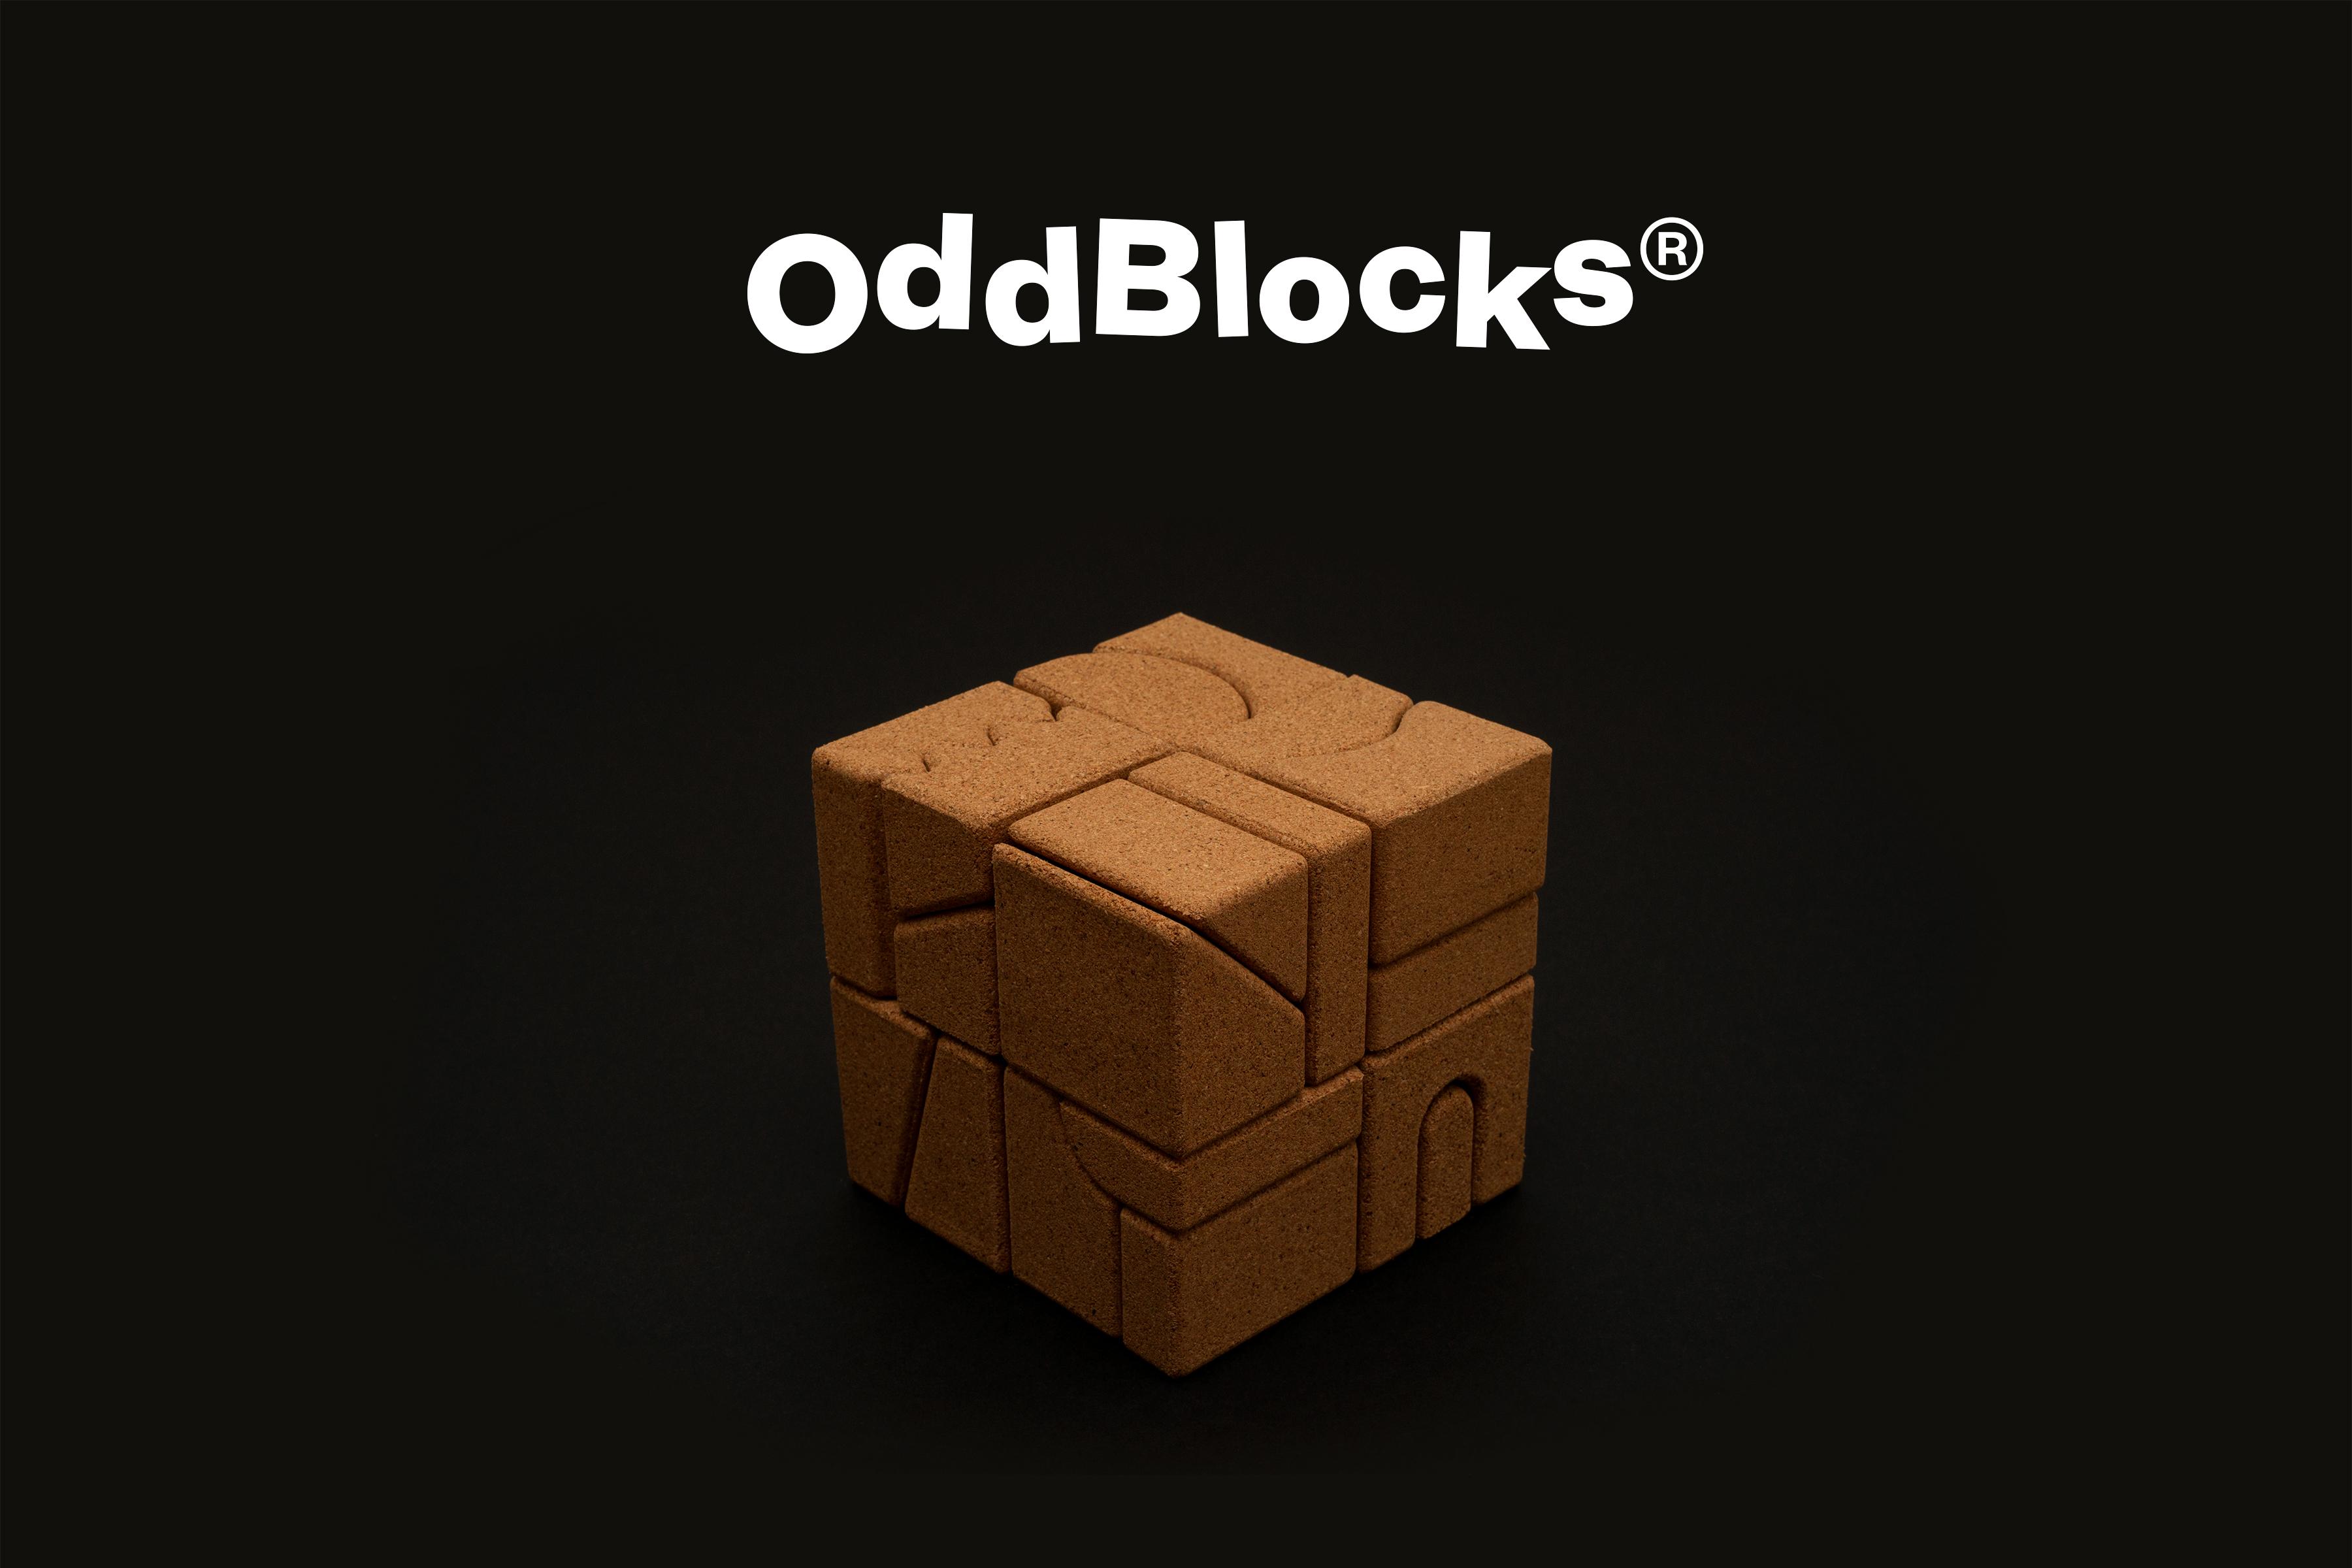 OddBlocks